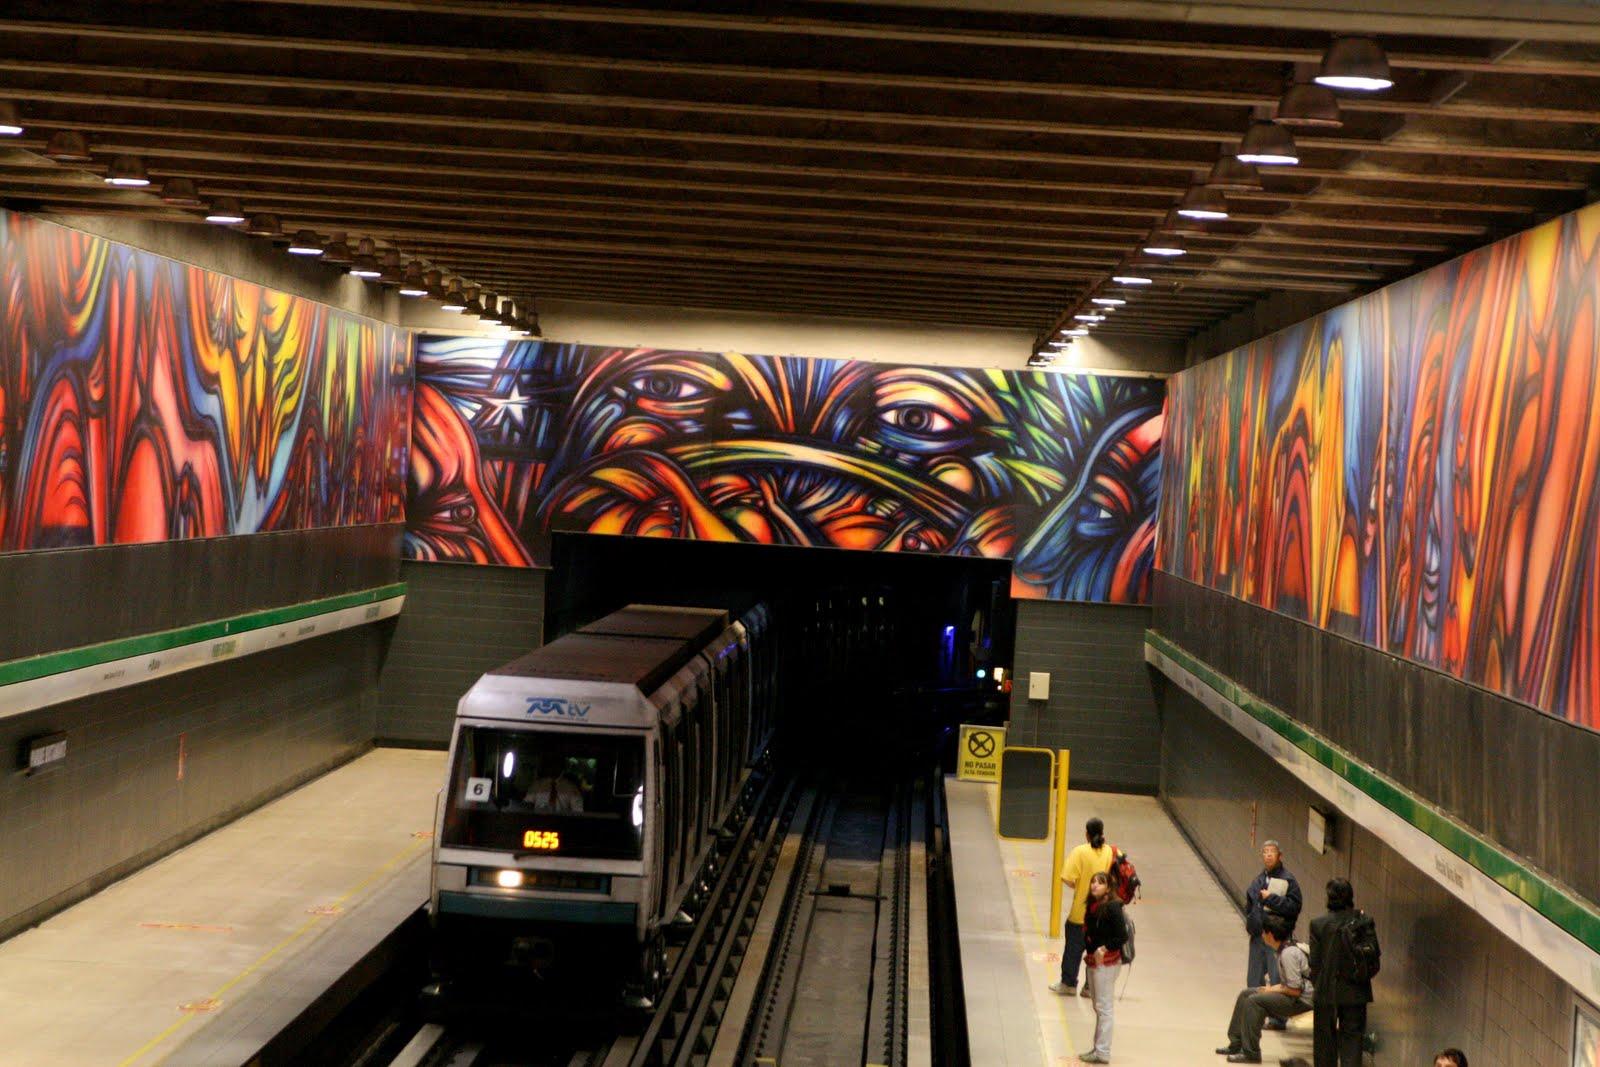 Mono gonz lez october 2011 for Mural metro u de chile